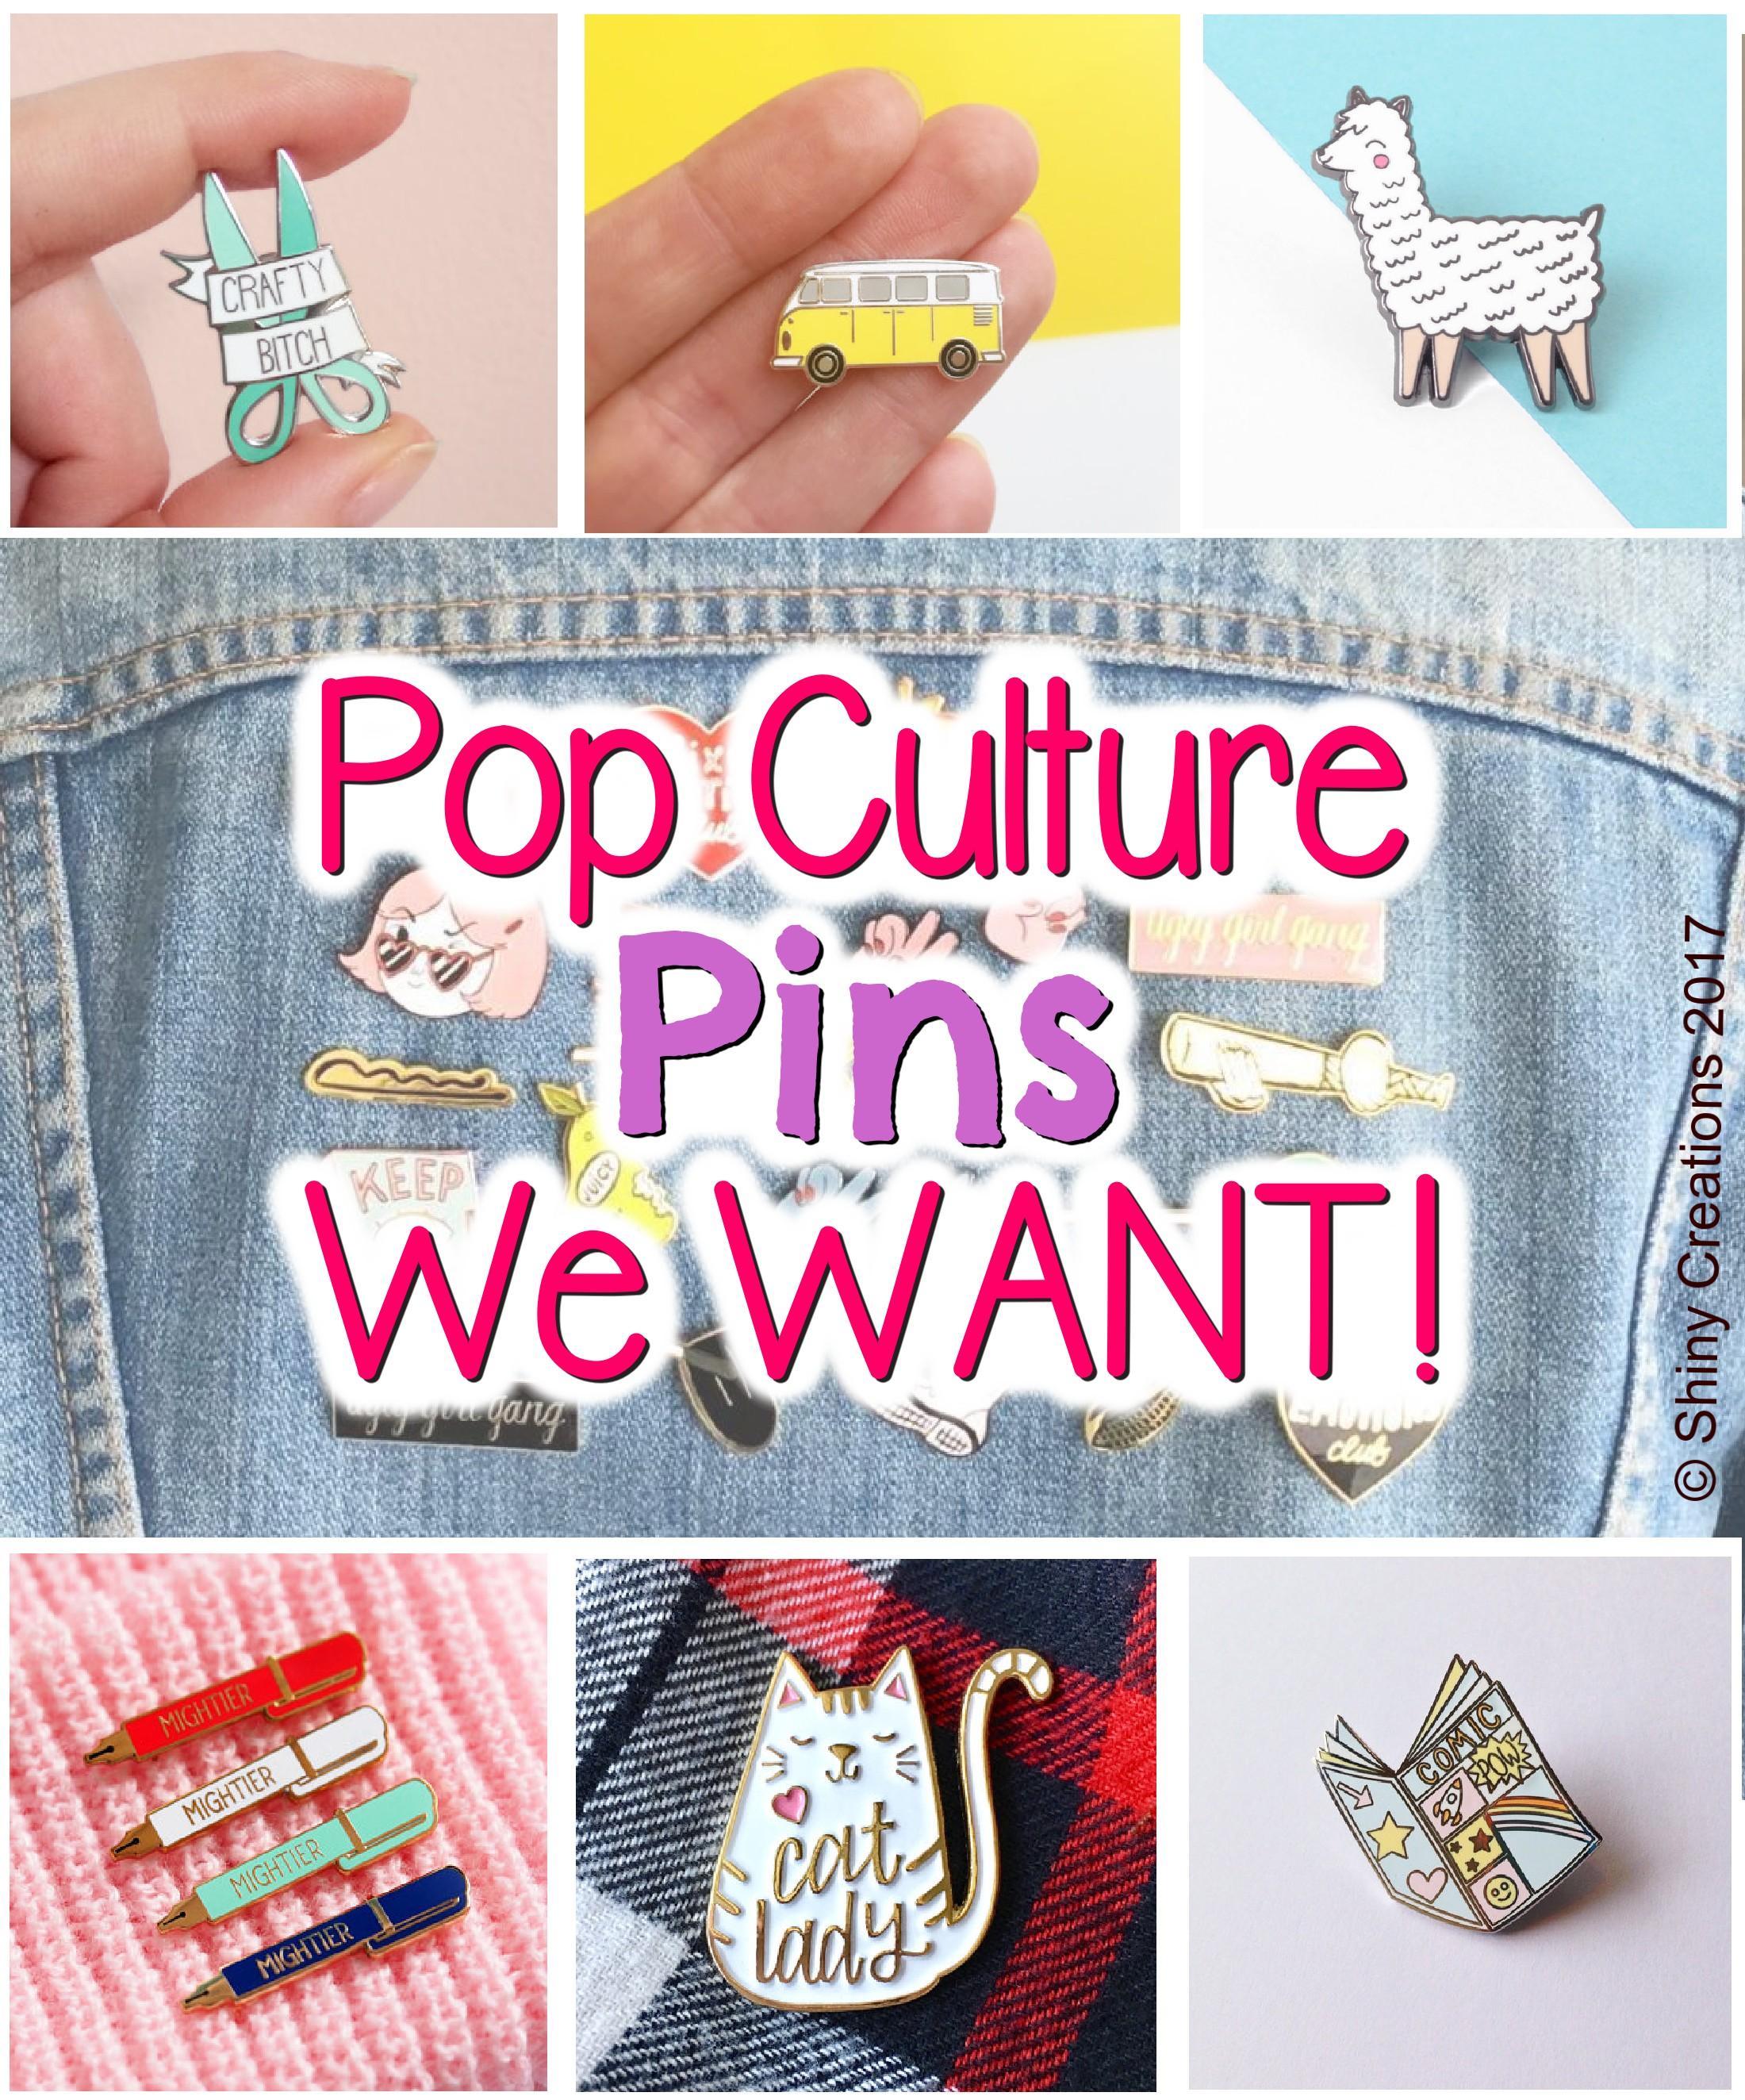 Enamel, pins, colourful, cute, quirky, art, craft, Etsy, funny, fashion, style, accessories, badges, pop culture, wish list, shop, shopping, llama, VW van, pen, cat lady, craft, artist, scissors, comic book, terrarium, cacti, cats, yin & yang,